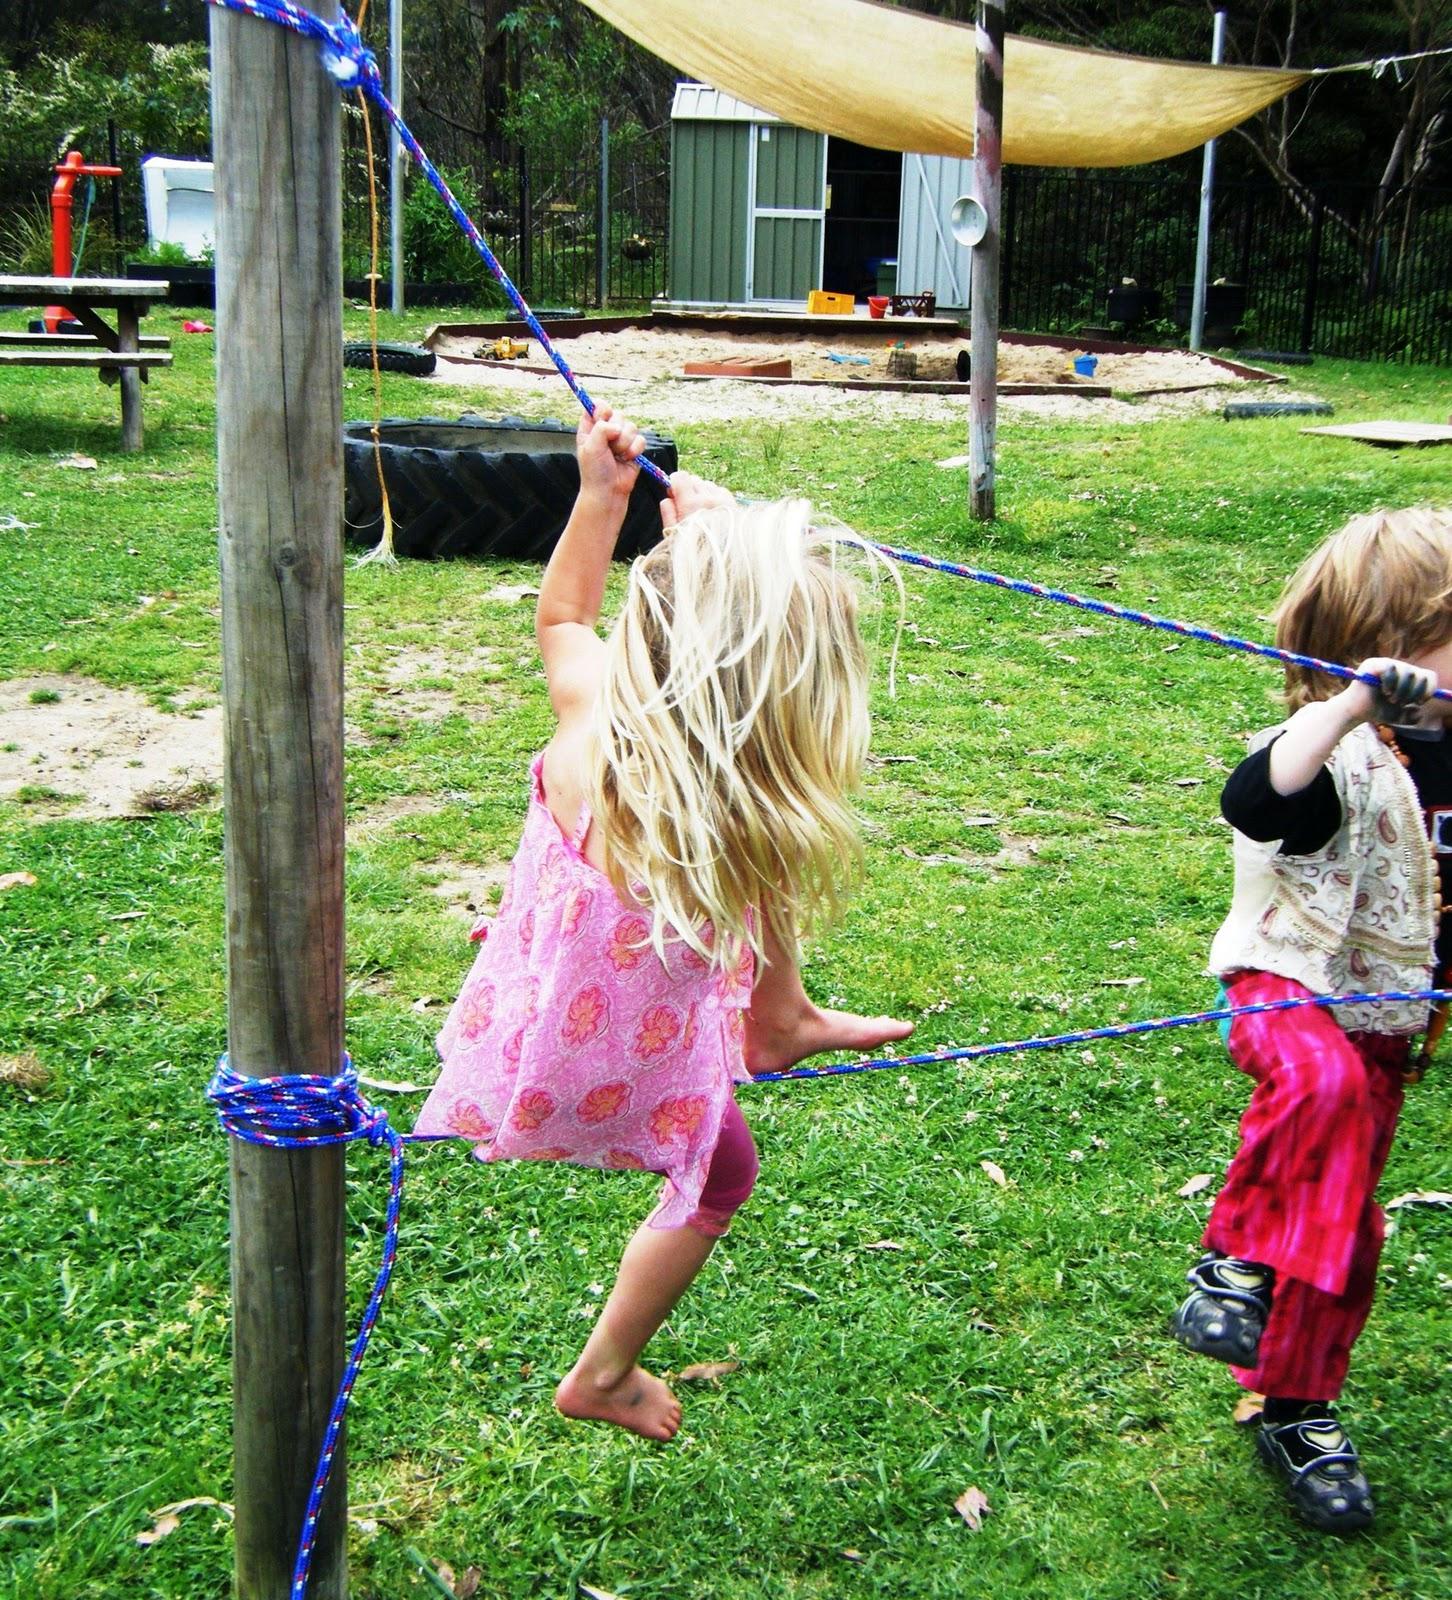 Backyard Rope Bridge let the children play: building a rope bridge